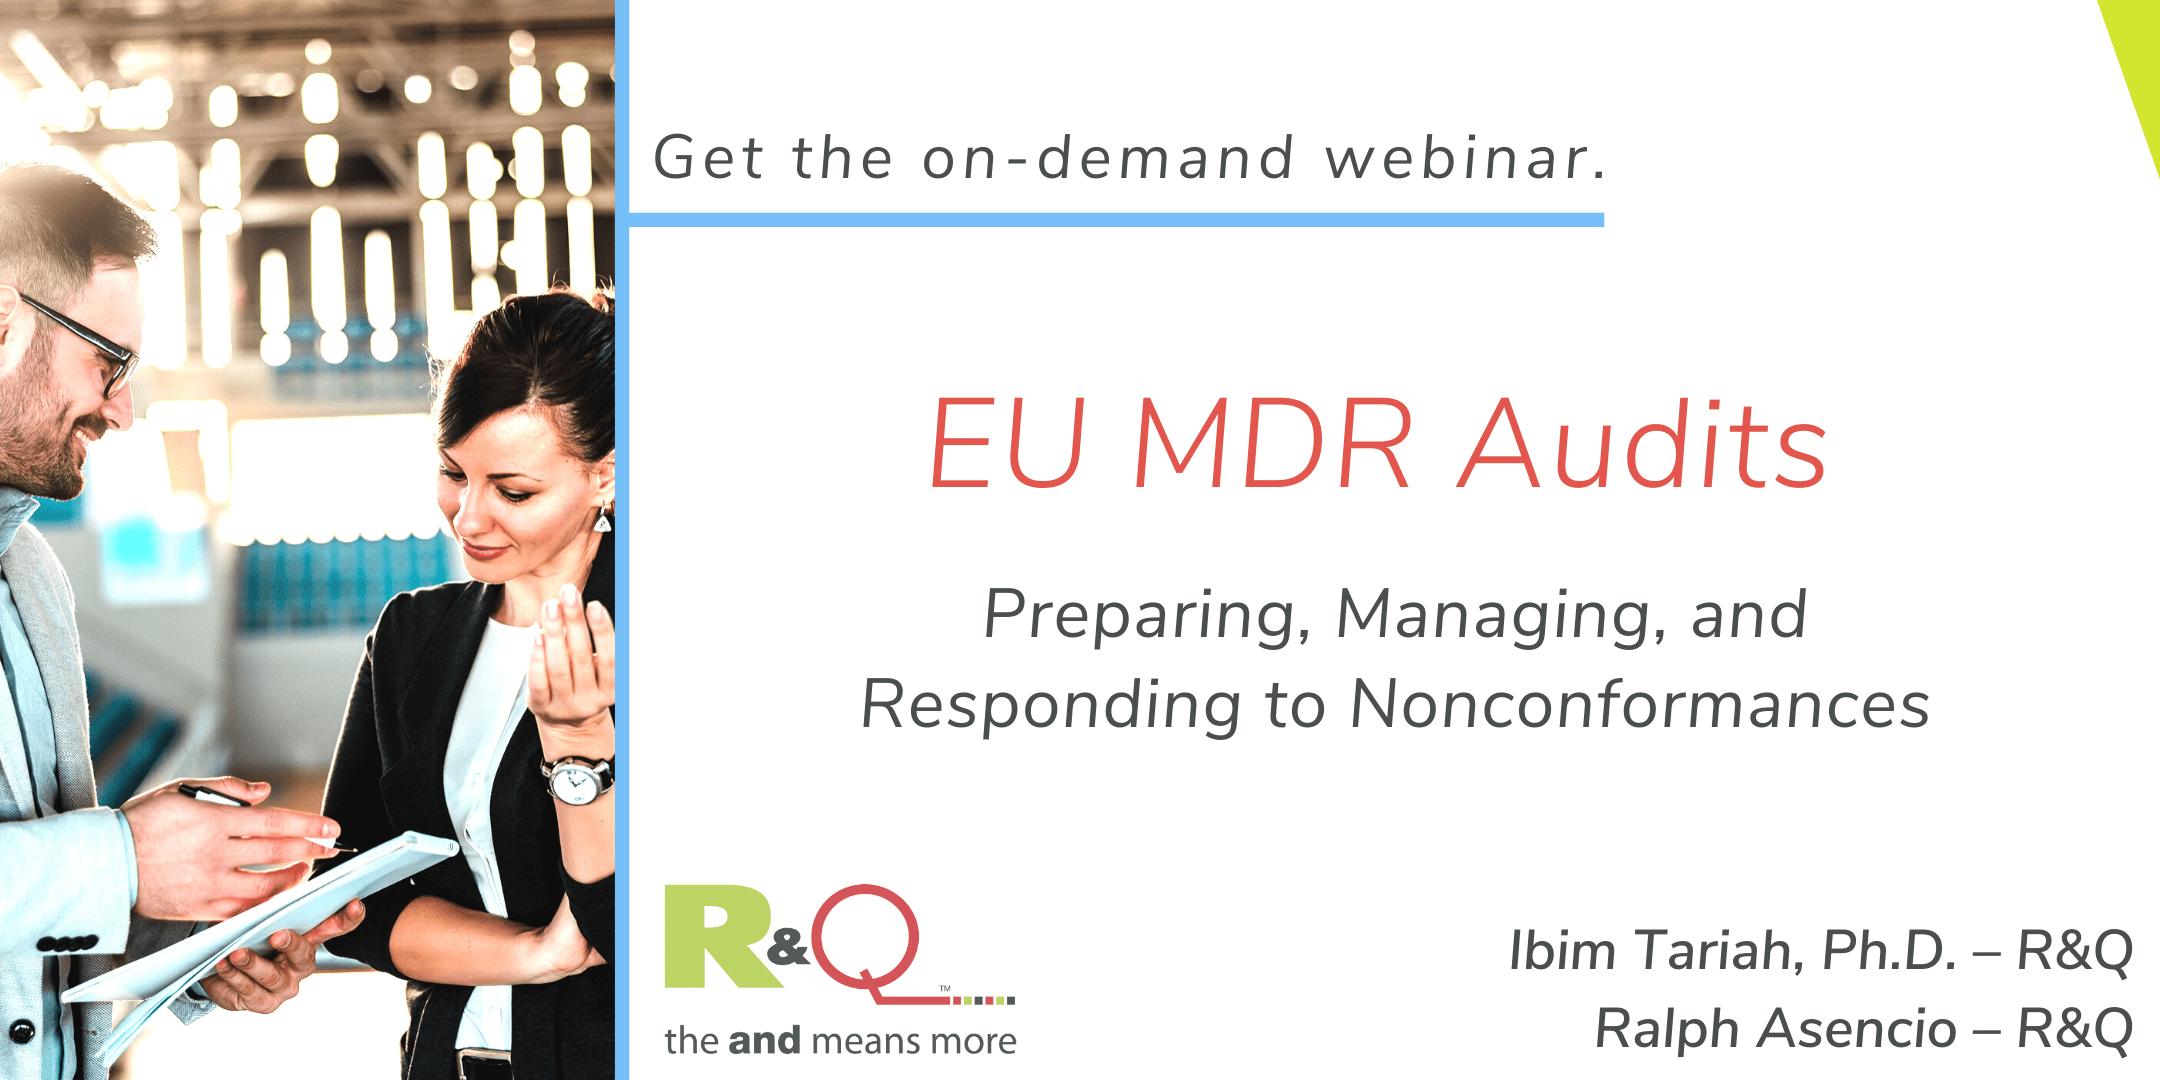 RQ_WB_EU_MDR_Audits_On_Demand-min